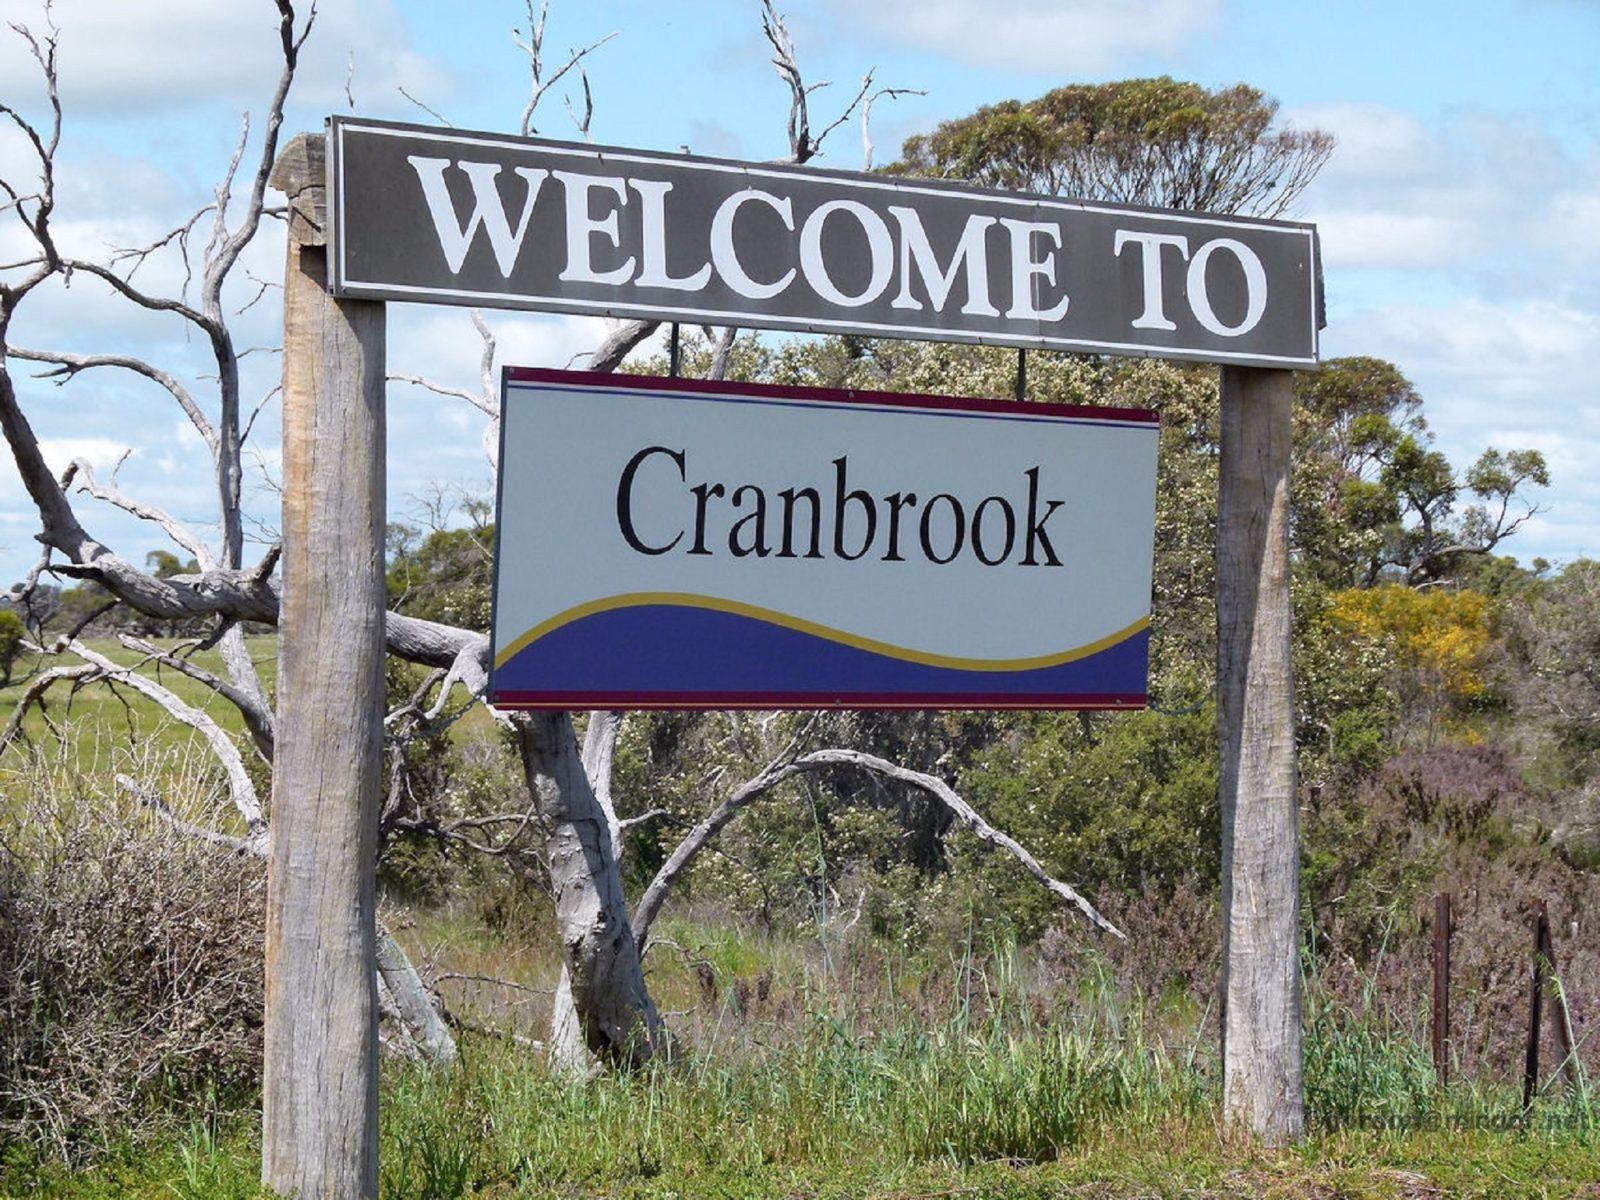 Cranbrook, Western Australia